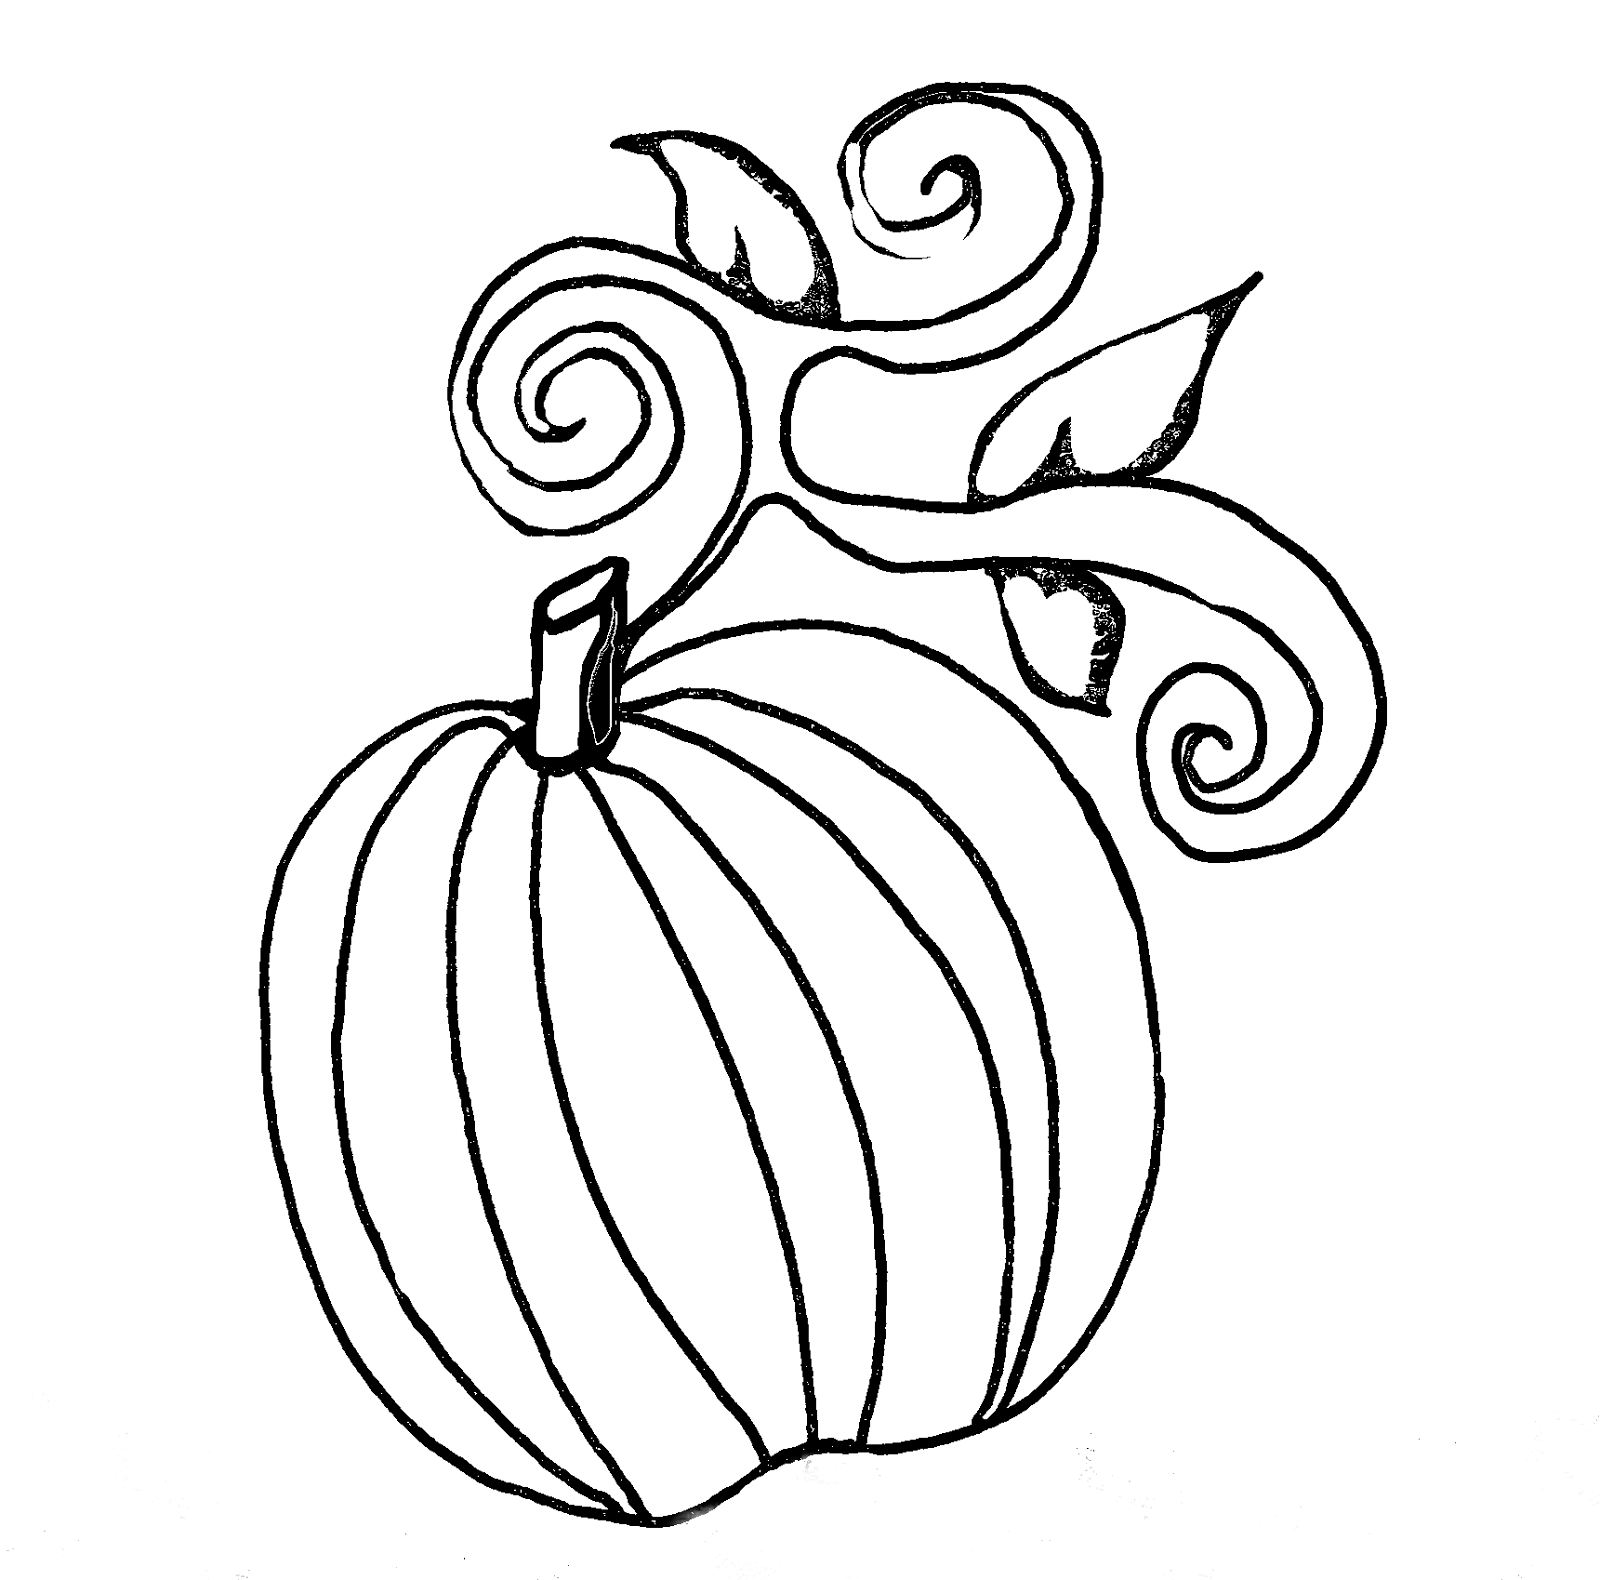 Treasure Box Drawing And Art For Jesus: Home Drawn Pumpkins